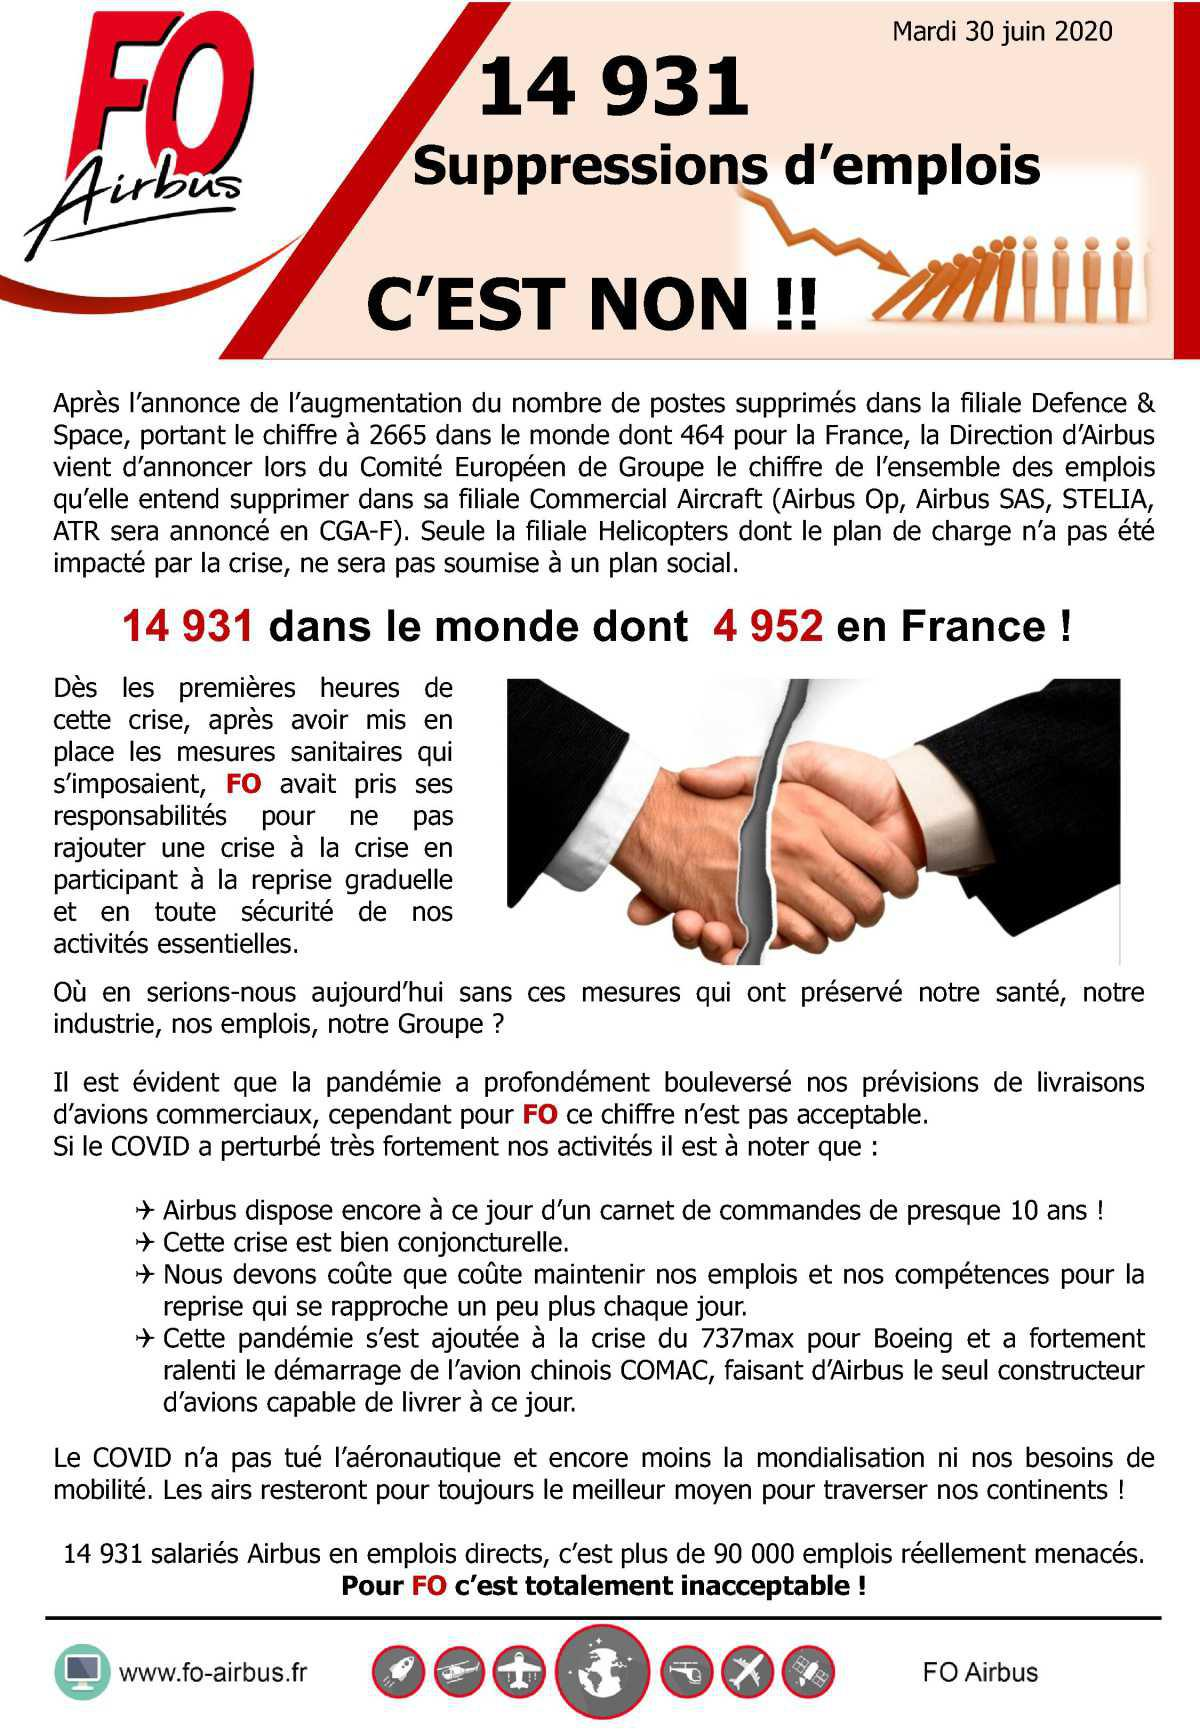 14931 Suppressions d'emplois C'EST NON !!